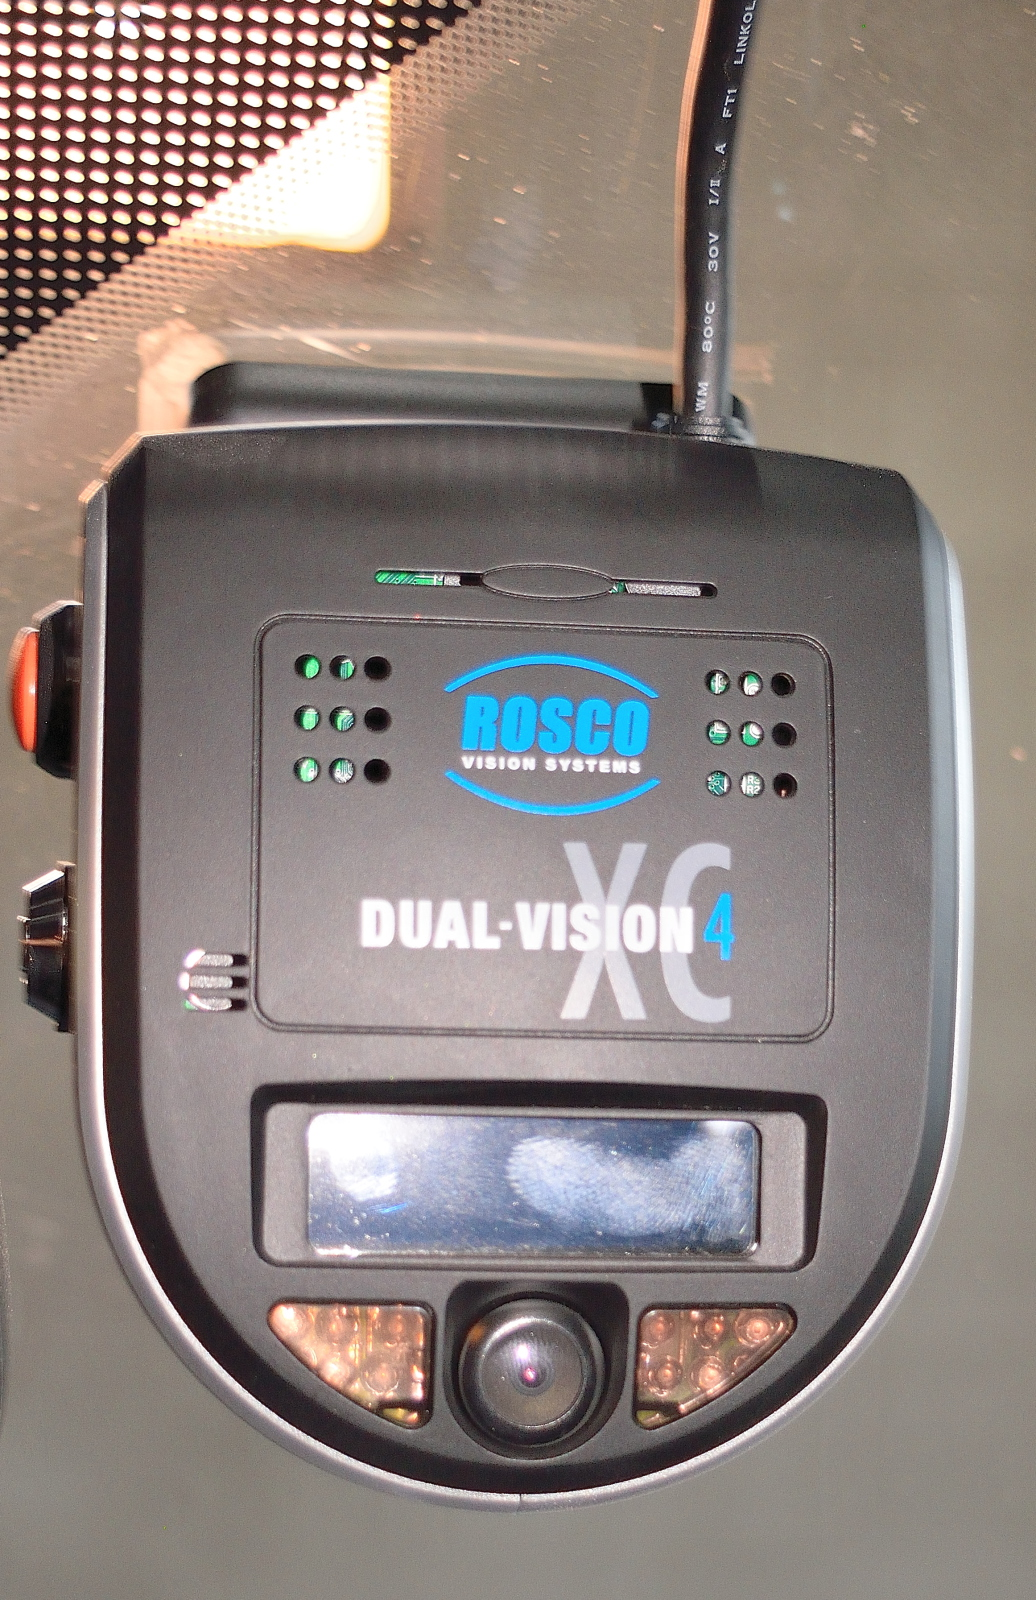 ROSCO DUAL-VISION Cameras - Cameras for transport and event monitoring.